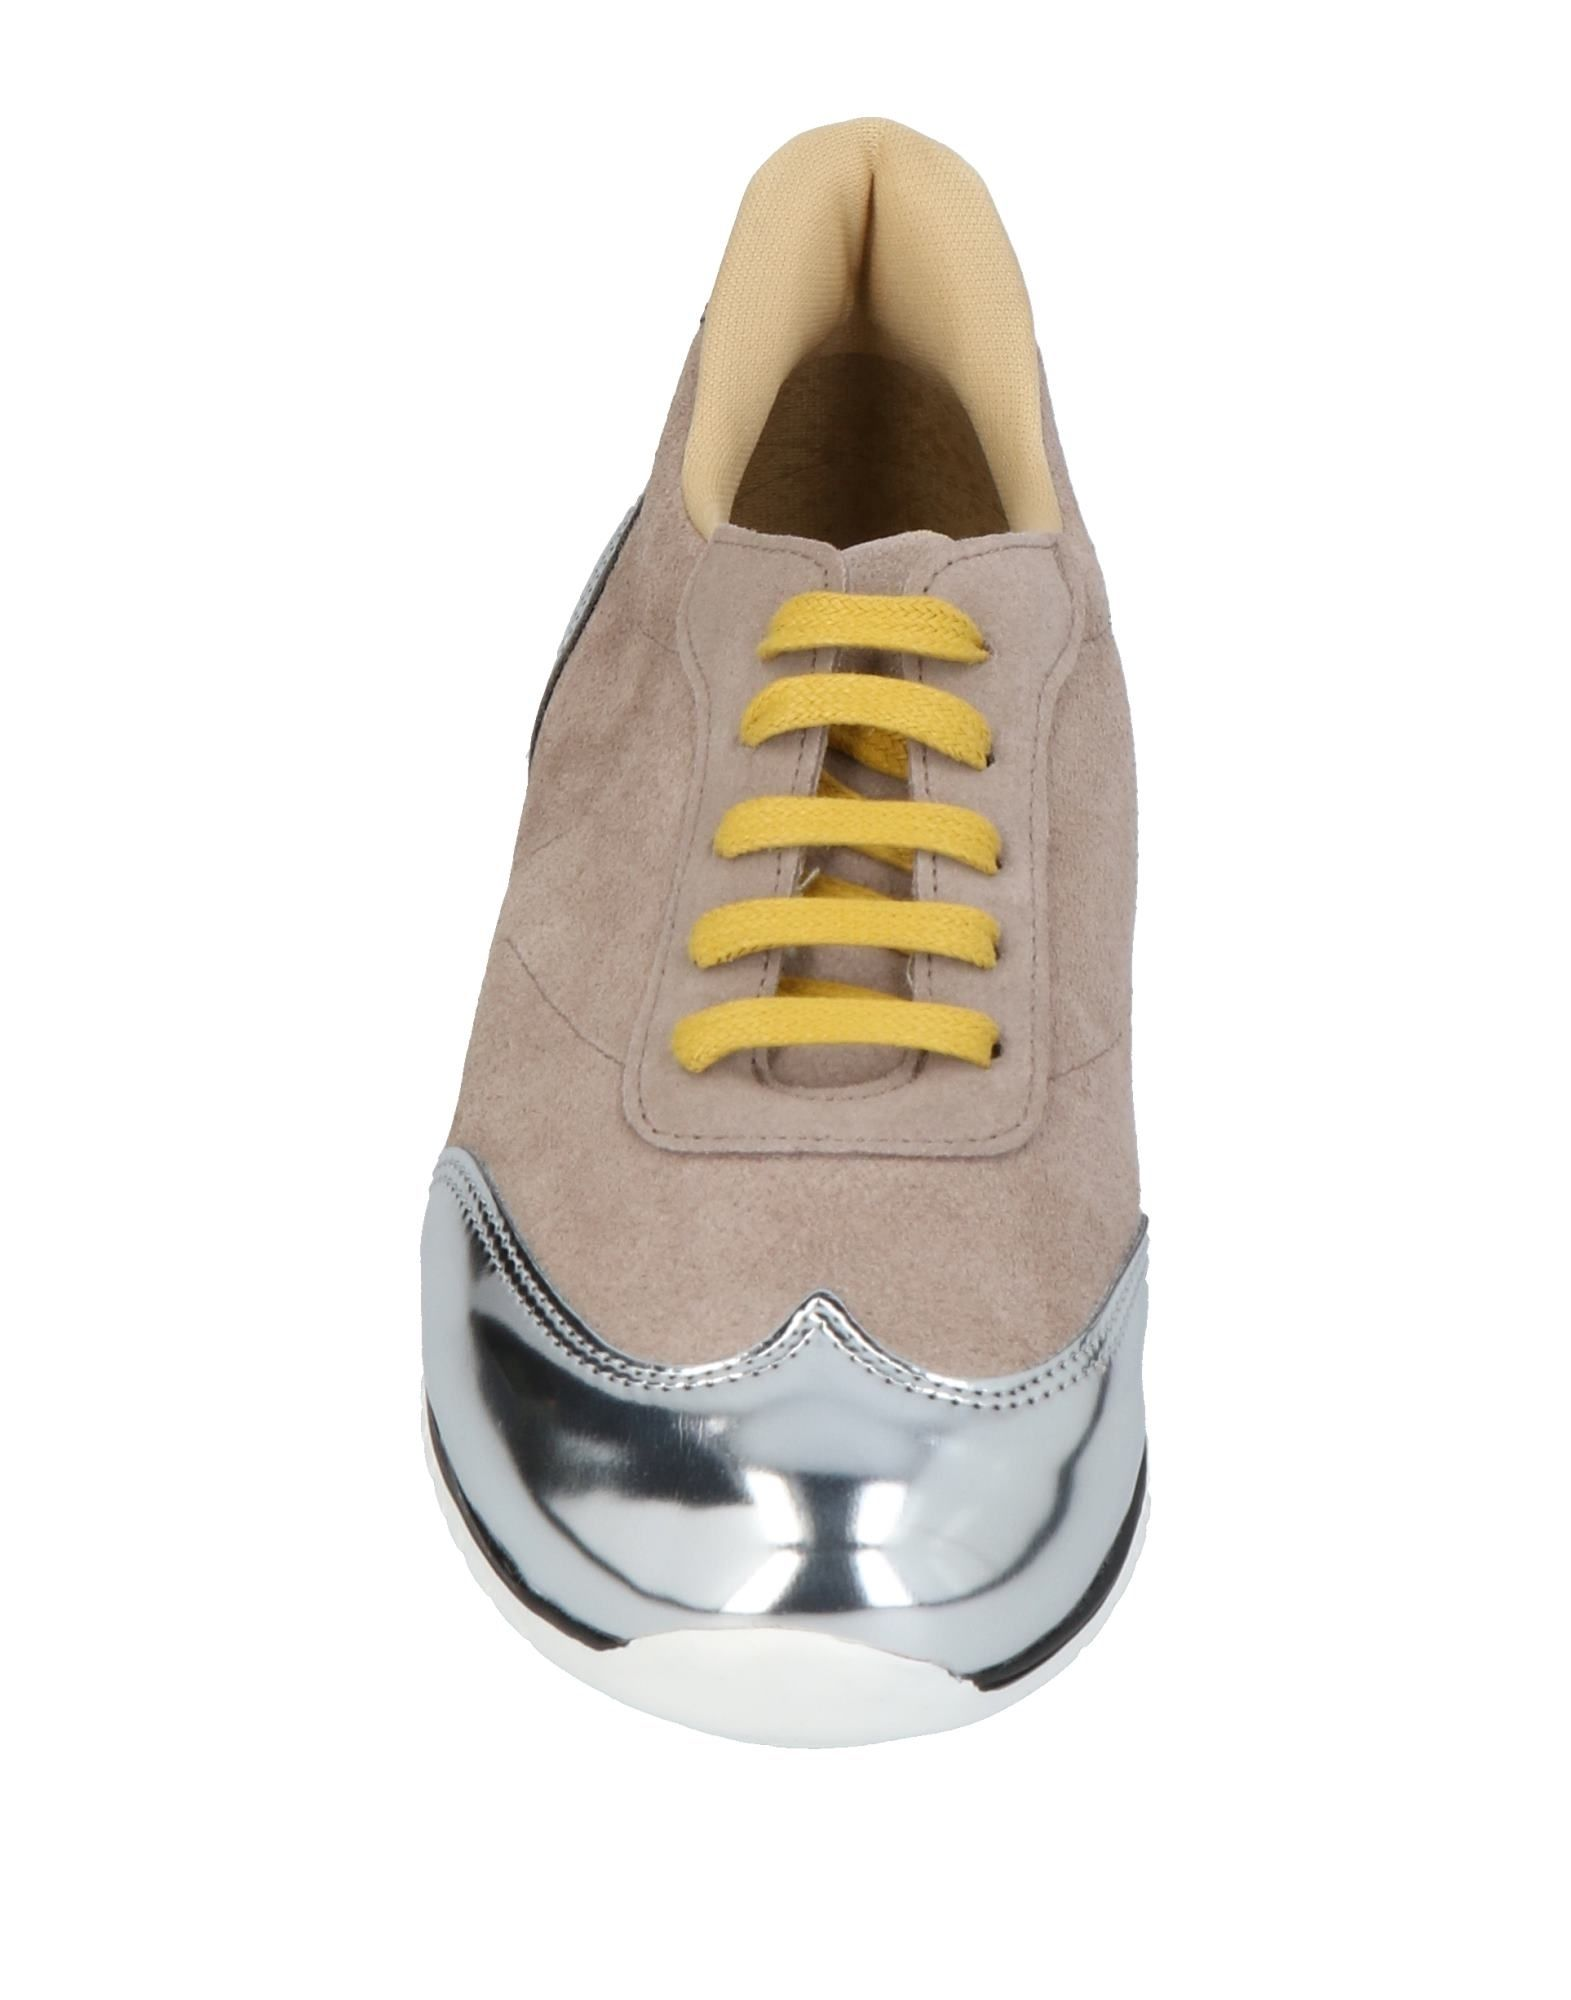 Moda Sneakers Cuplé Donna - 11442735DT